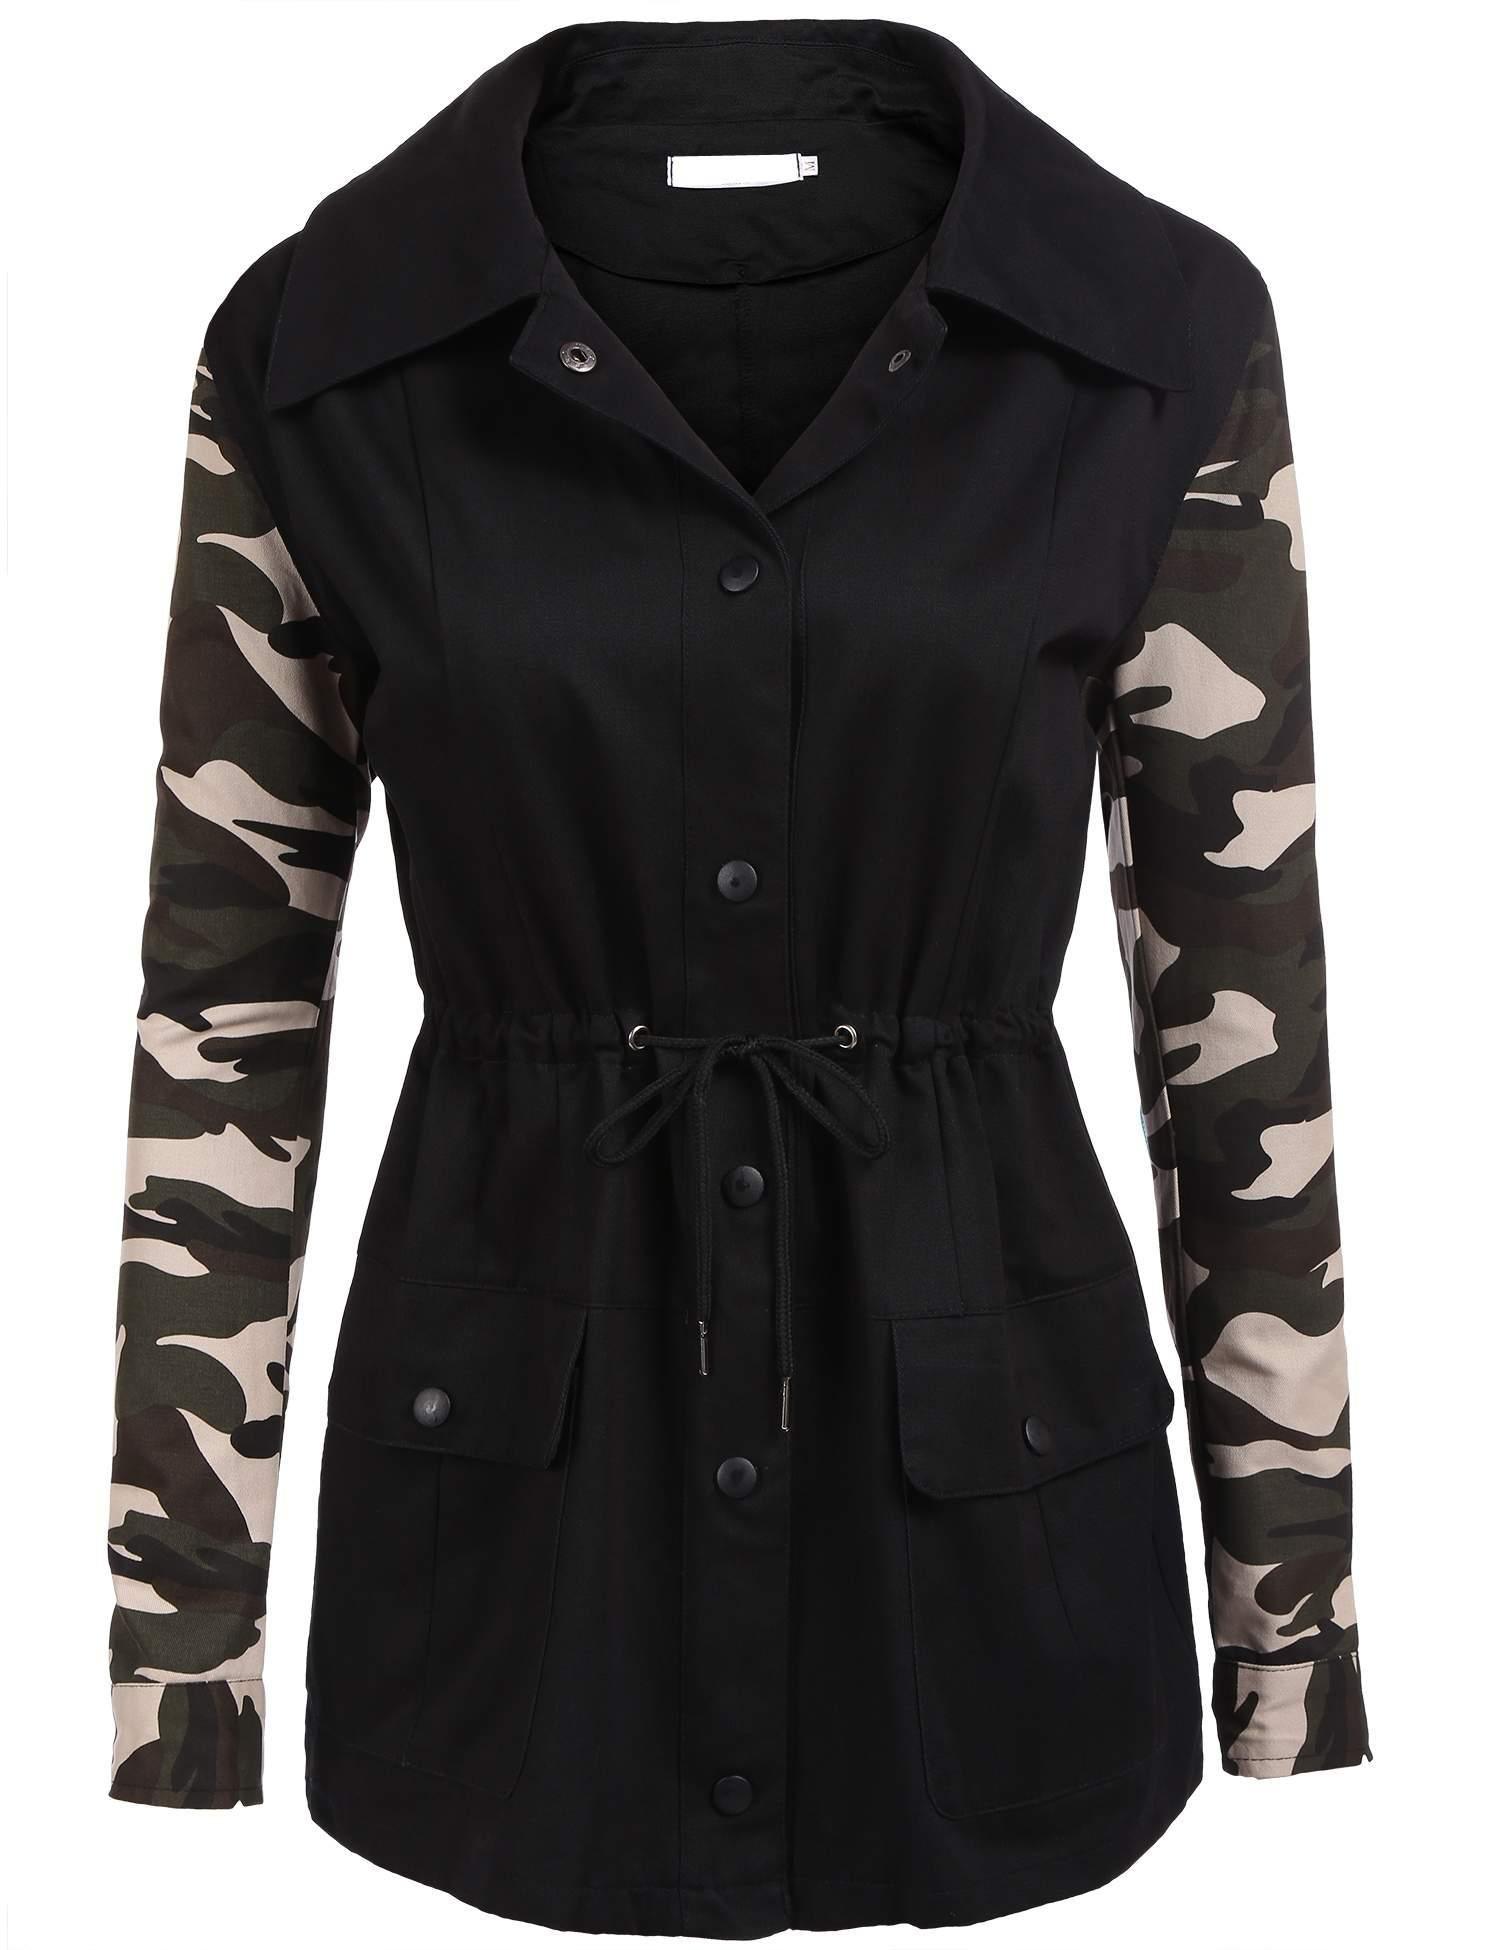 SoTeer Women's Military Camouflage Jacket Denim Camo Coats (Black, L)